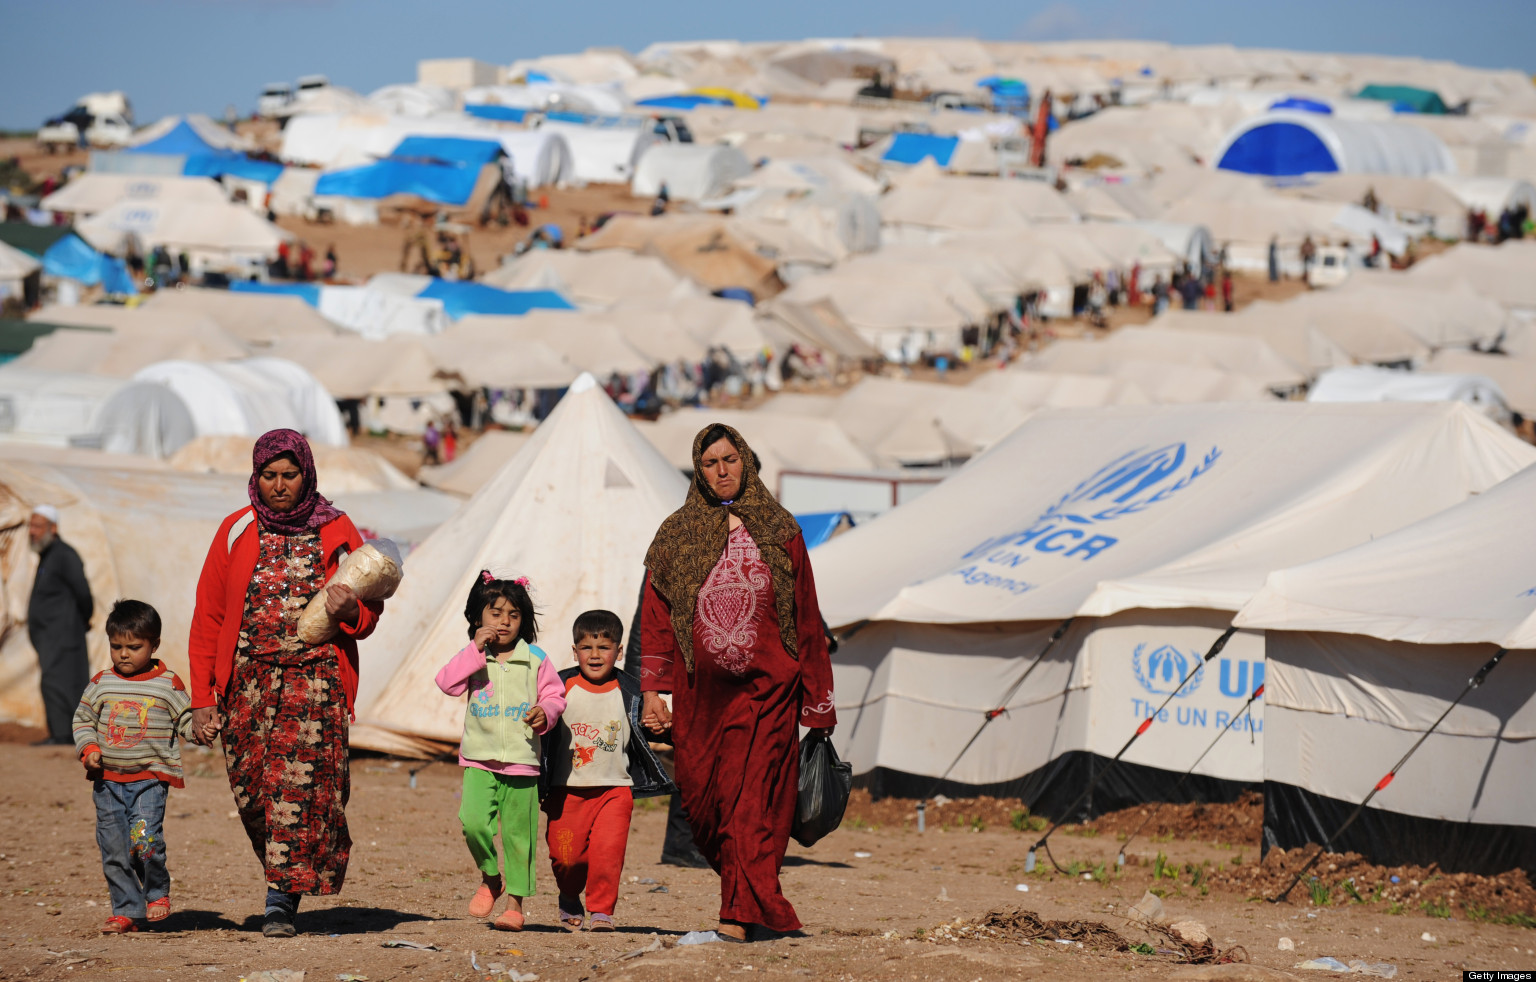 The Syrian Civil War: A Humanitarian Crisis